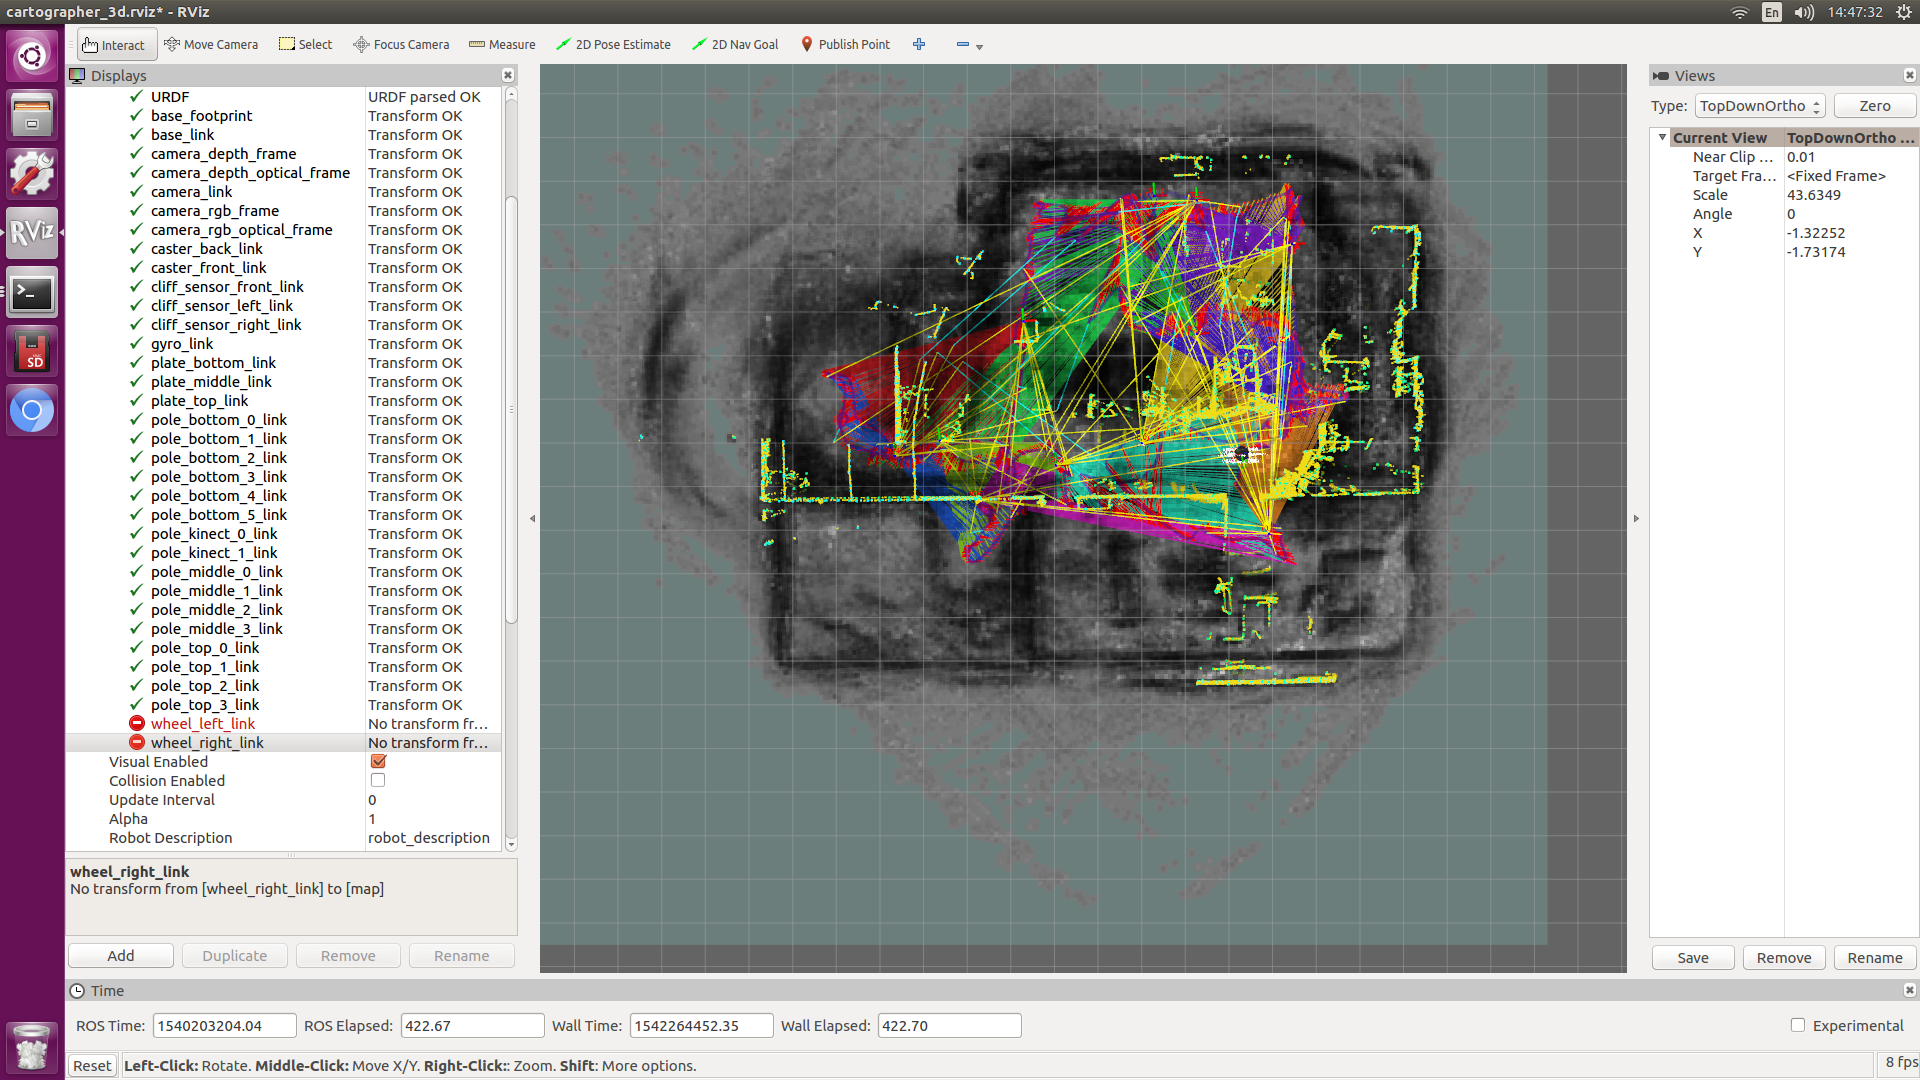 Turbot-SLAM入门教程-实现cartographer 3D建图(多线雷达rslidar-16版)